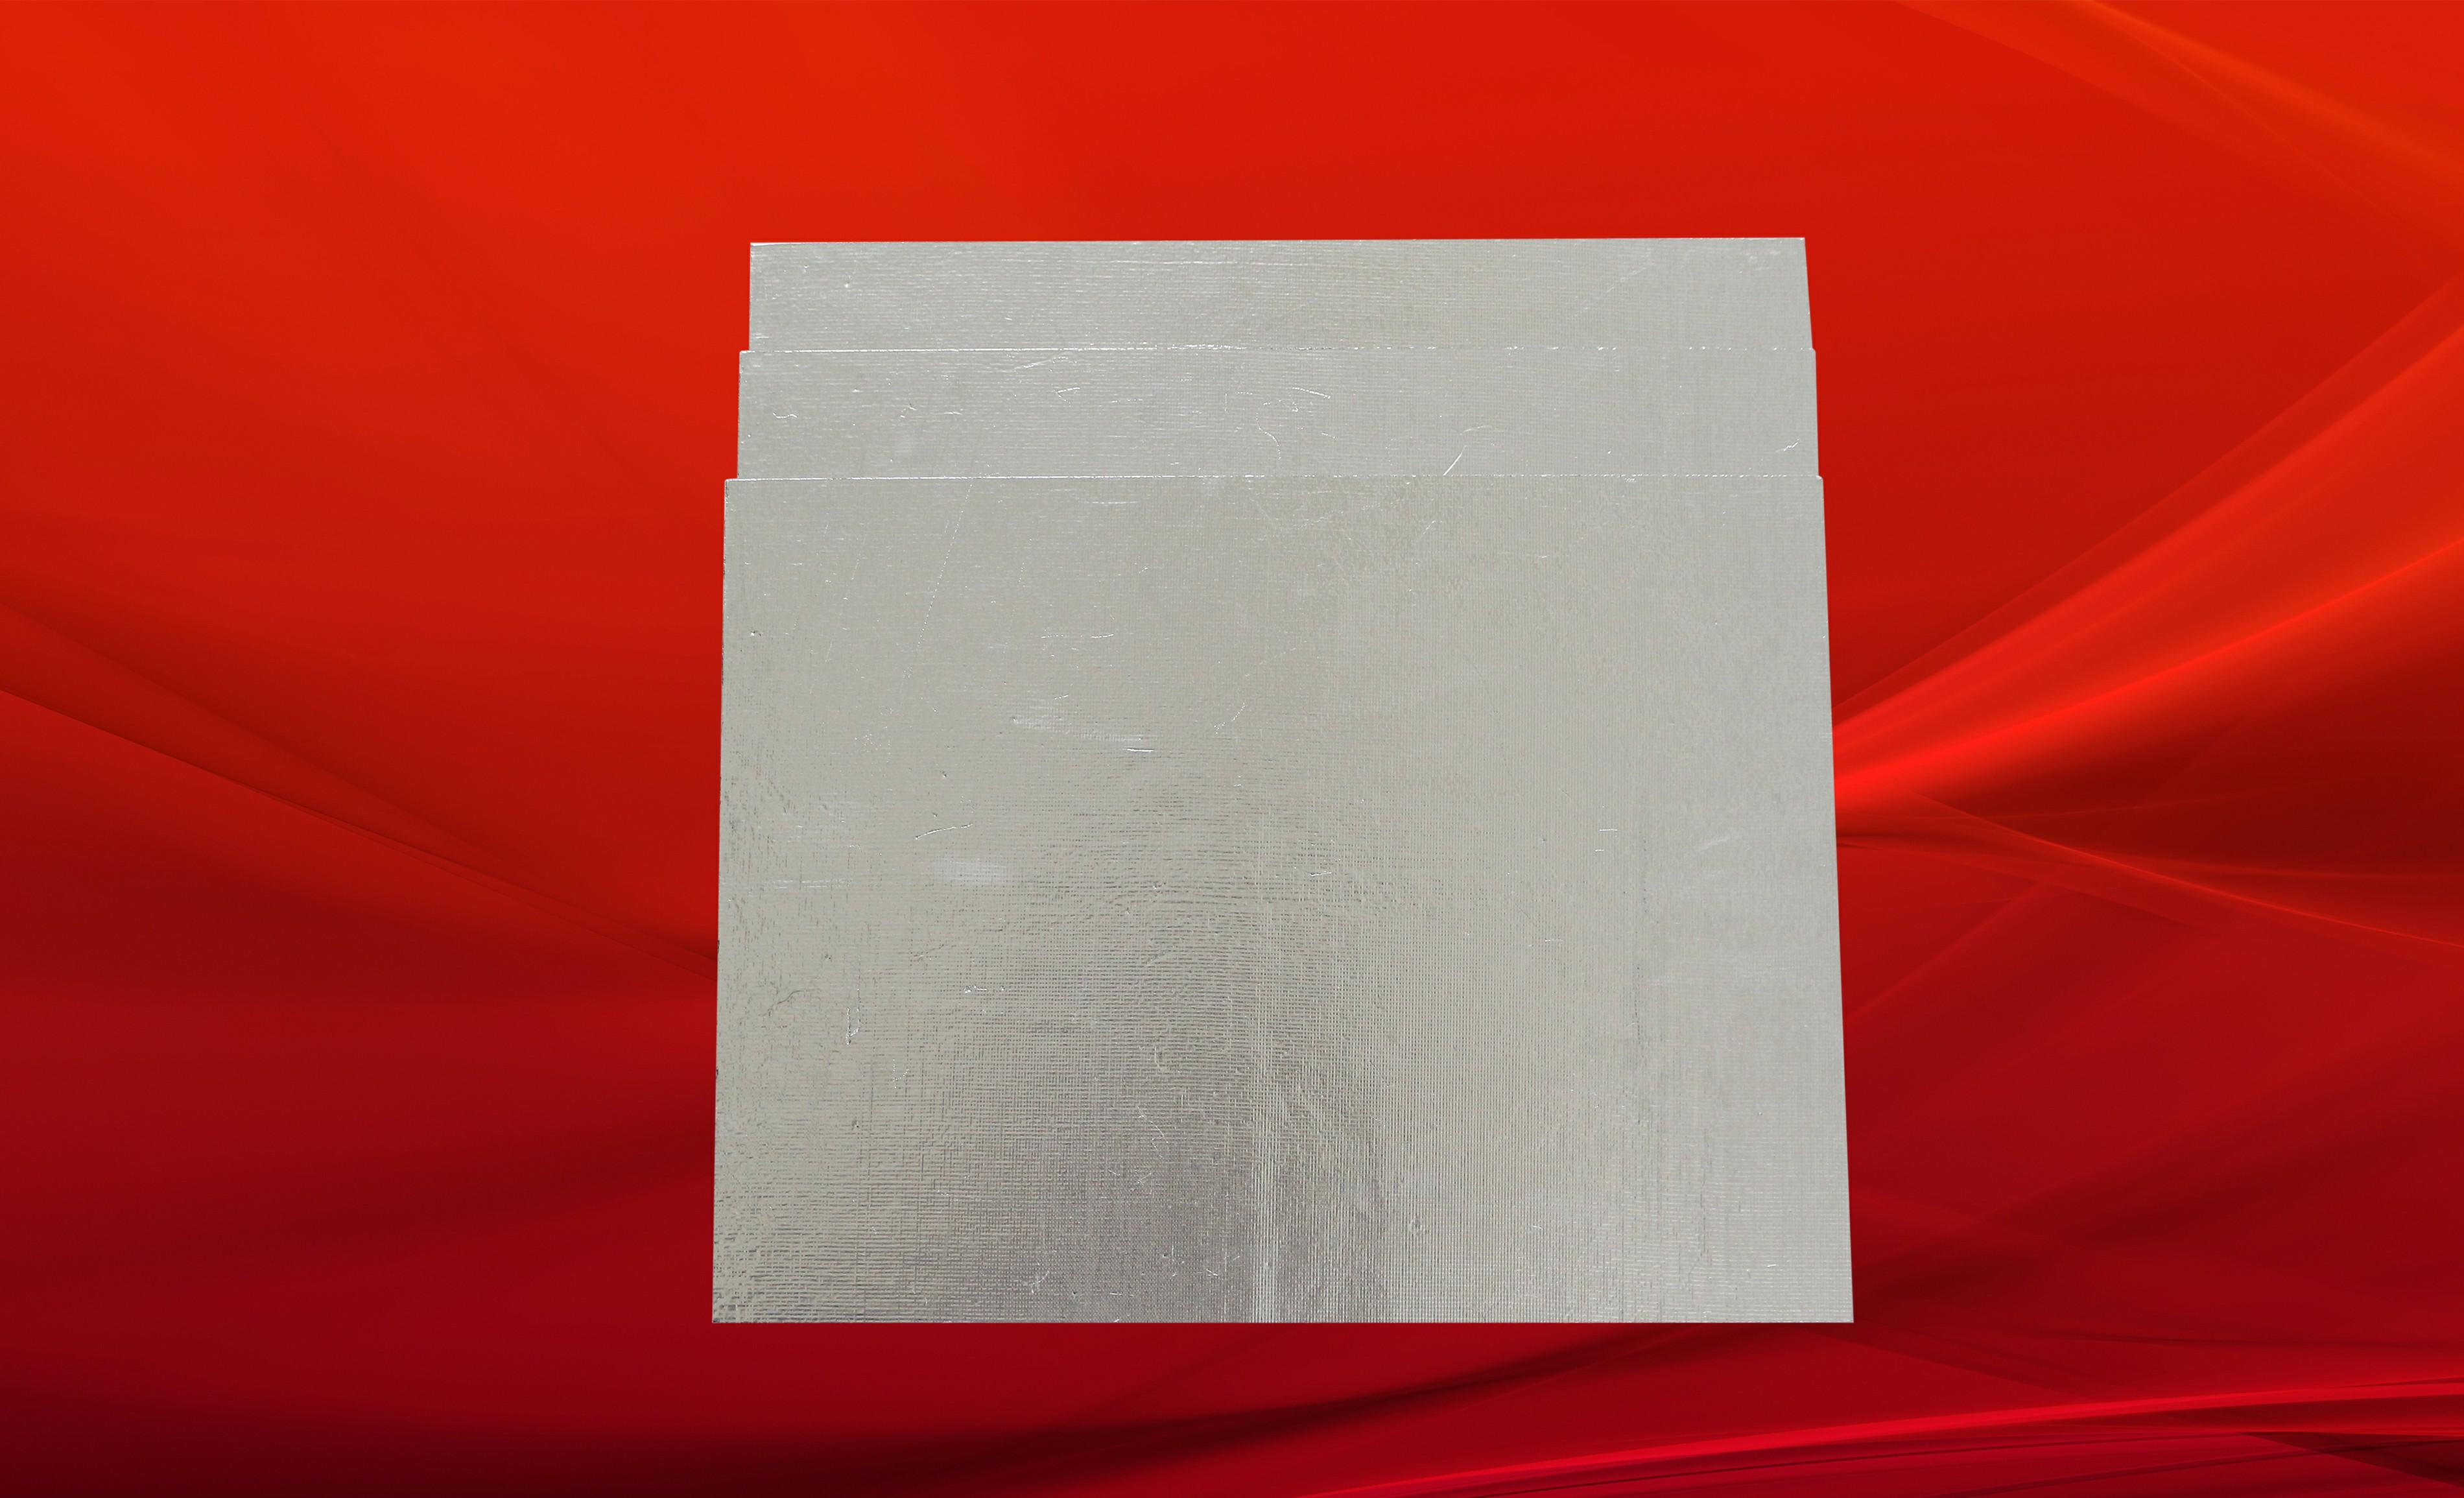 High-strength nano-ceramic fiberboard 5